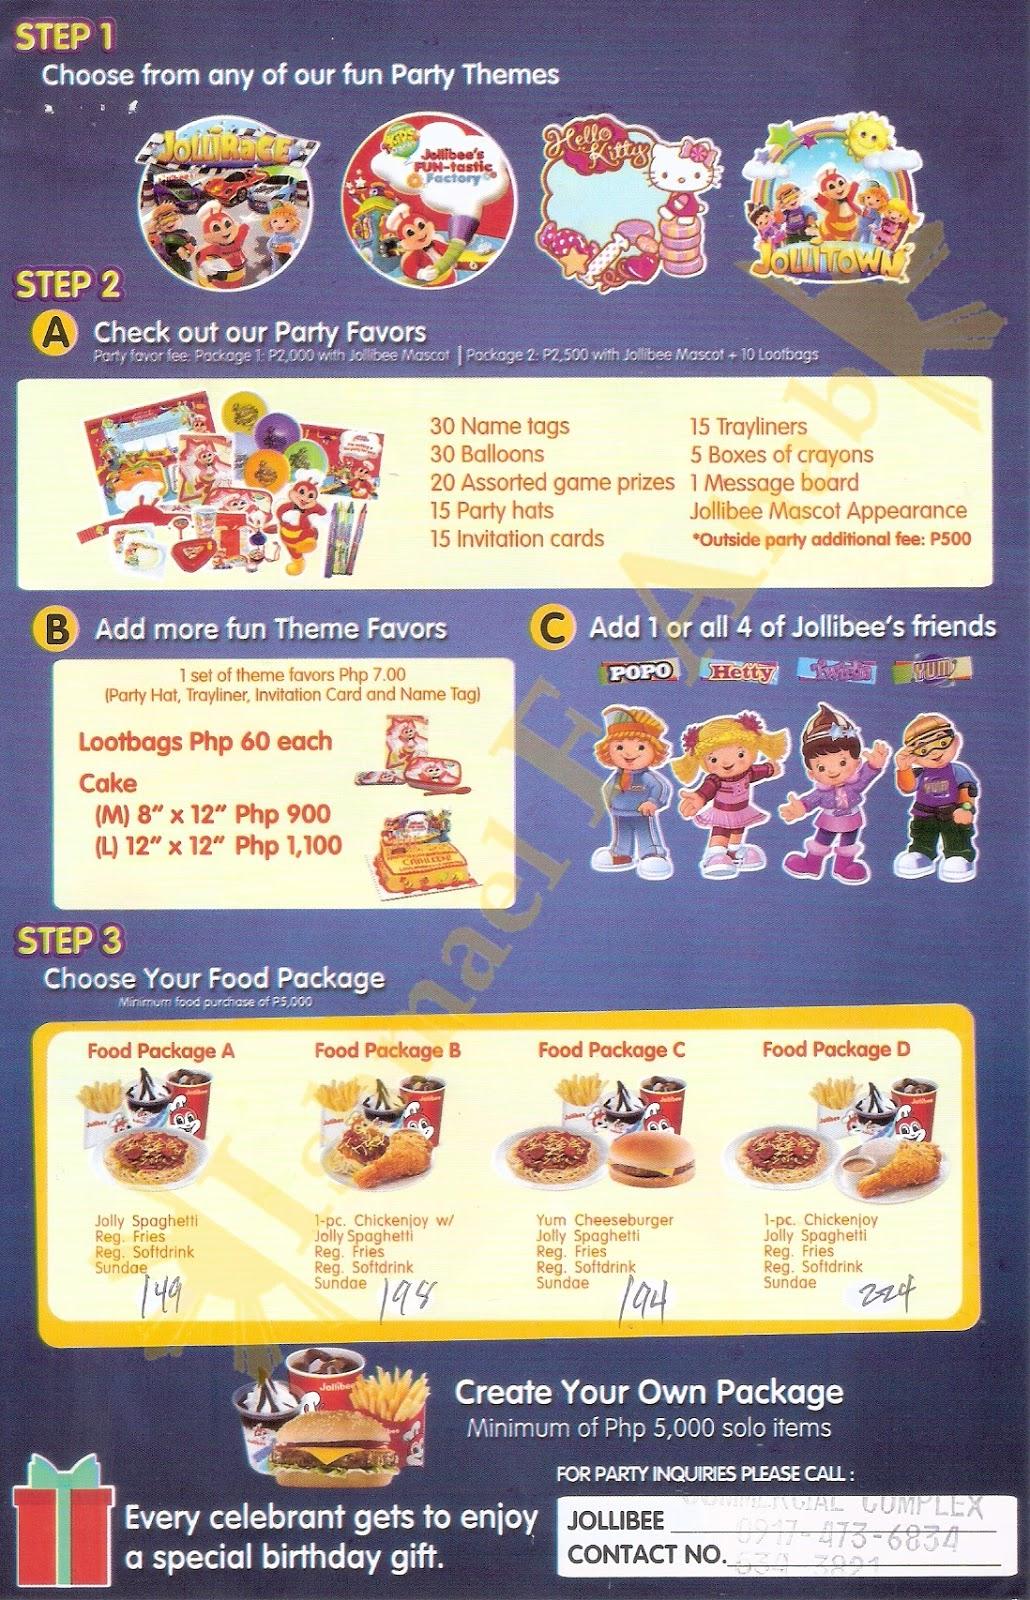 The pinoy informer jollibee birthday party package brochure 2017 jollibee birthday party package brochure 2017 stopboris Gallery